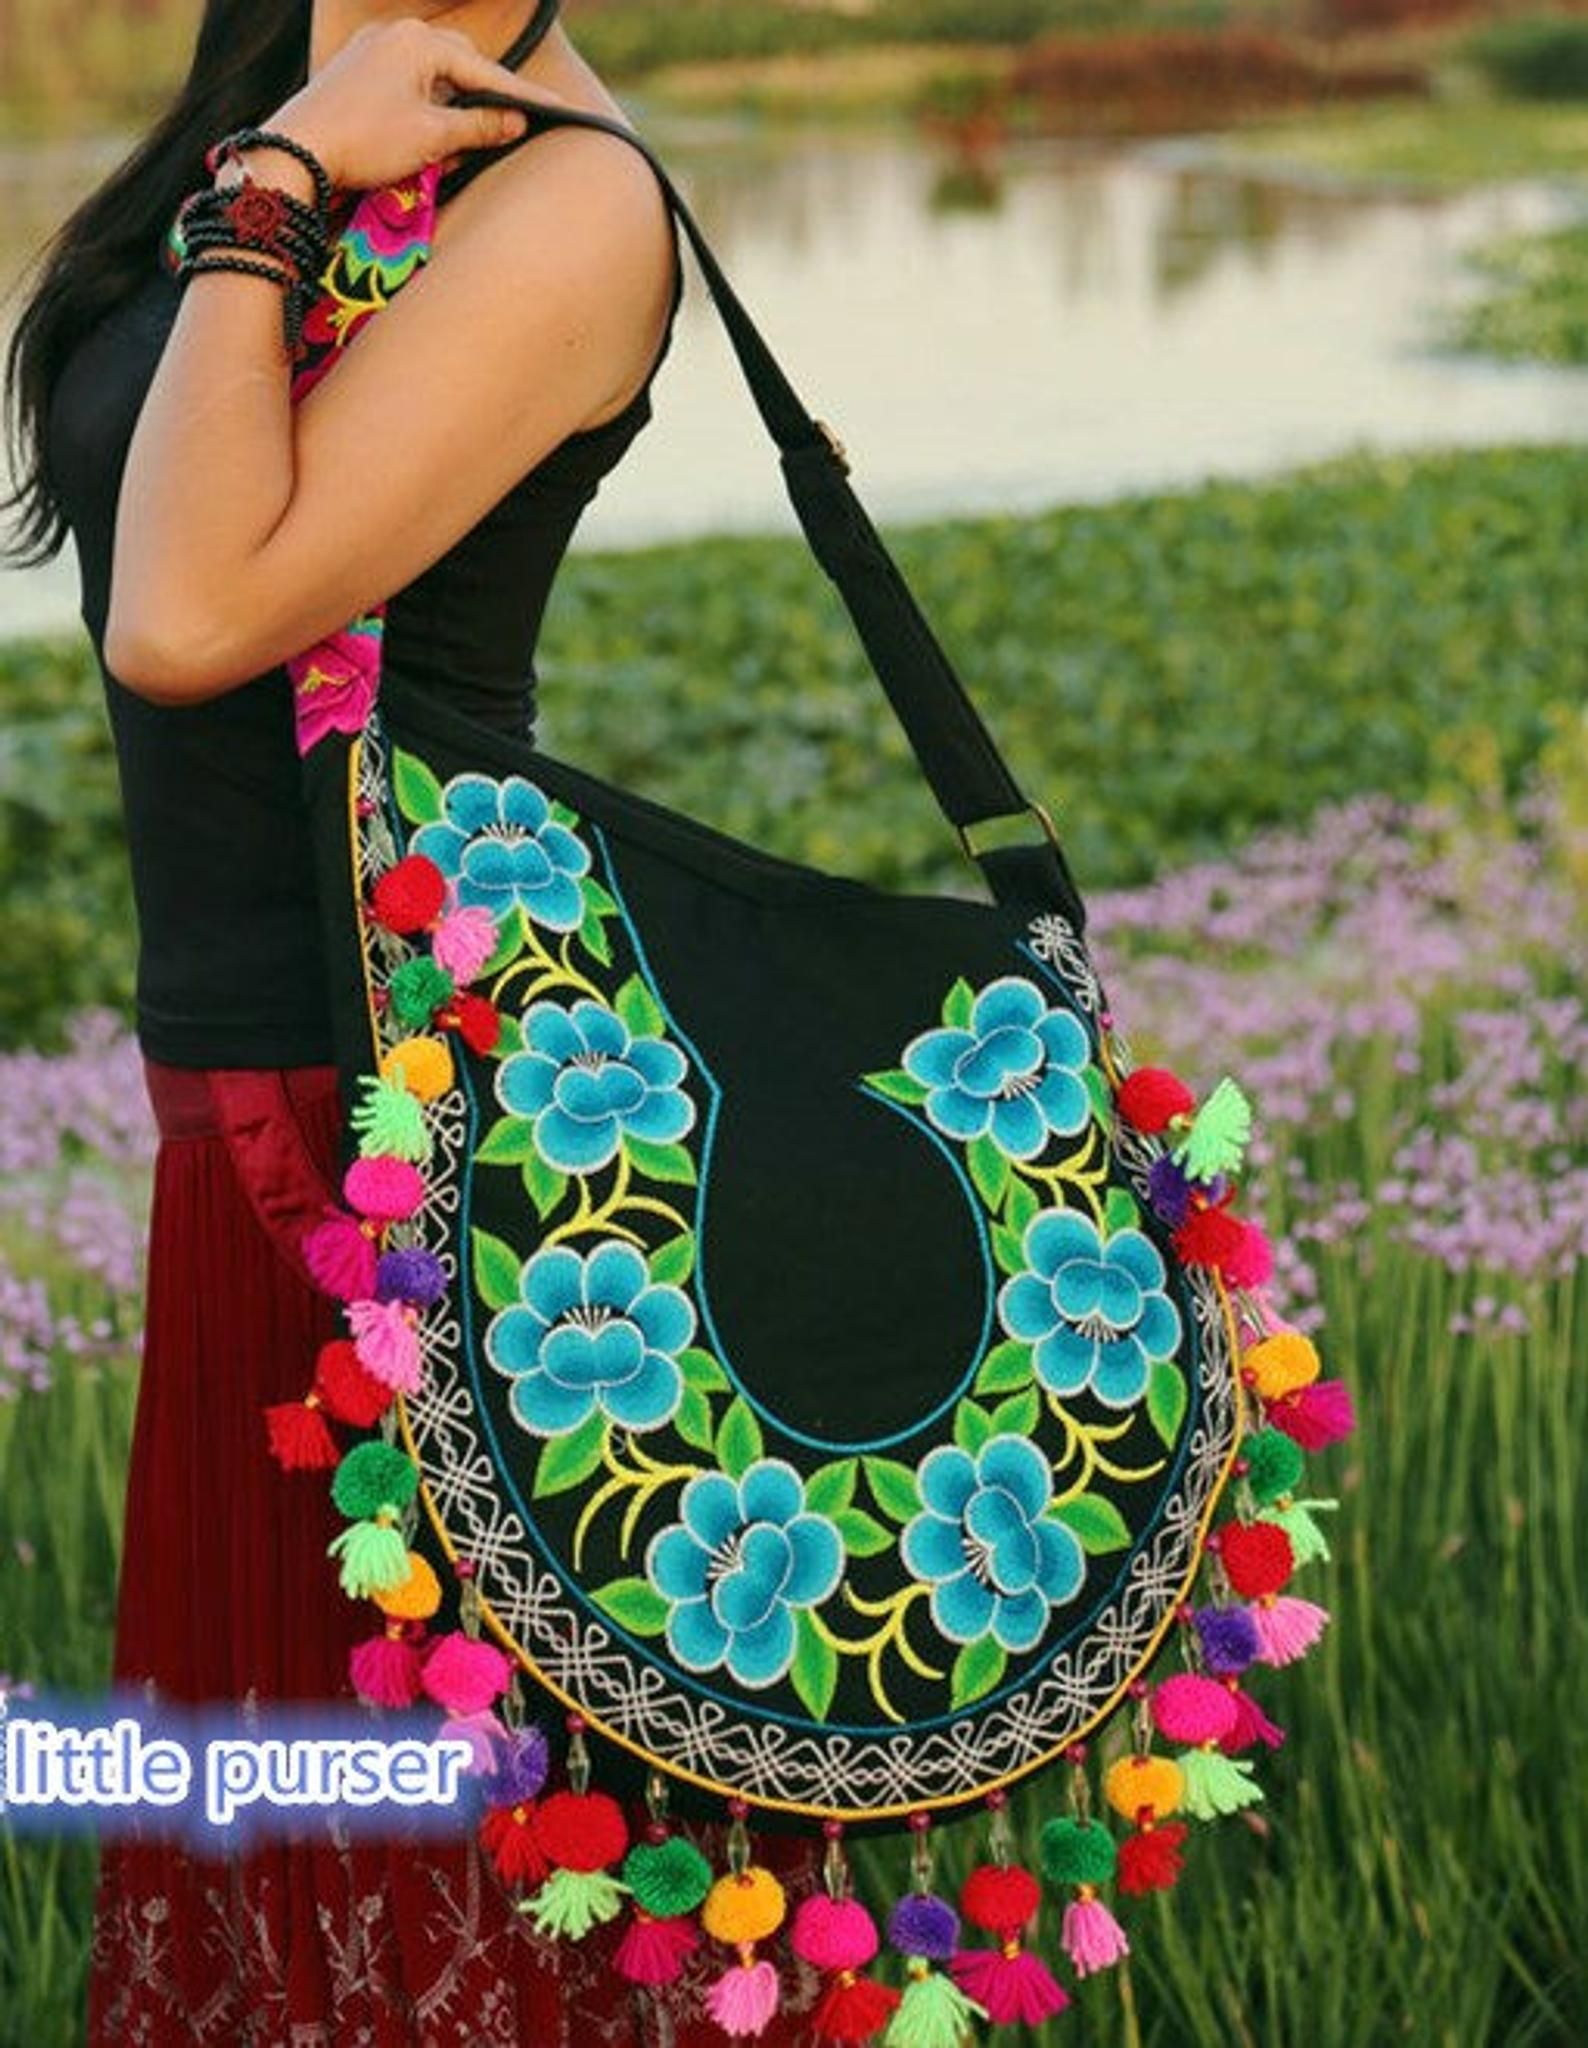 Embroidery bag folk style bag bag canvas bag Handmade embroidery bag purse Hand Made Embroidery Great Floral Pattern Tote Bag